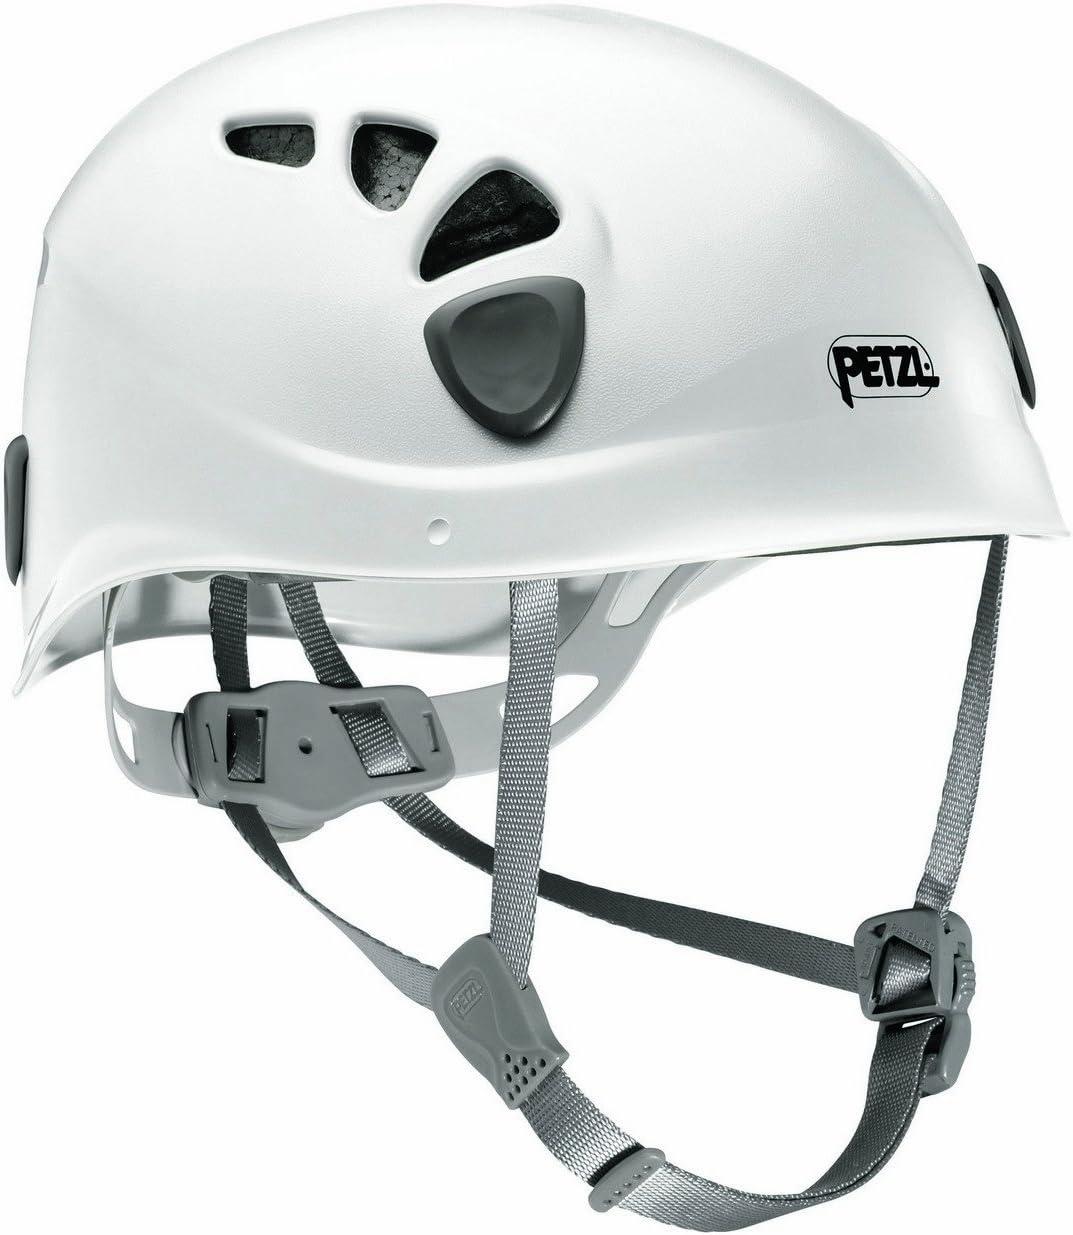 Peltz - Petzl casco elios 53-61cm: Amazon.es: Deportes y aire ...